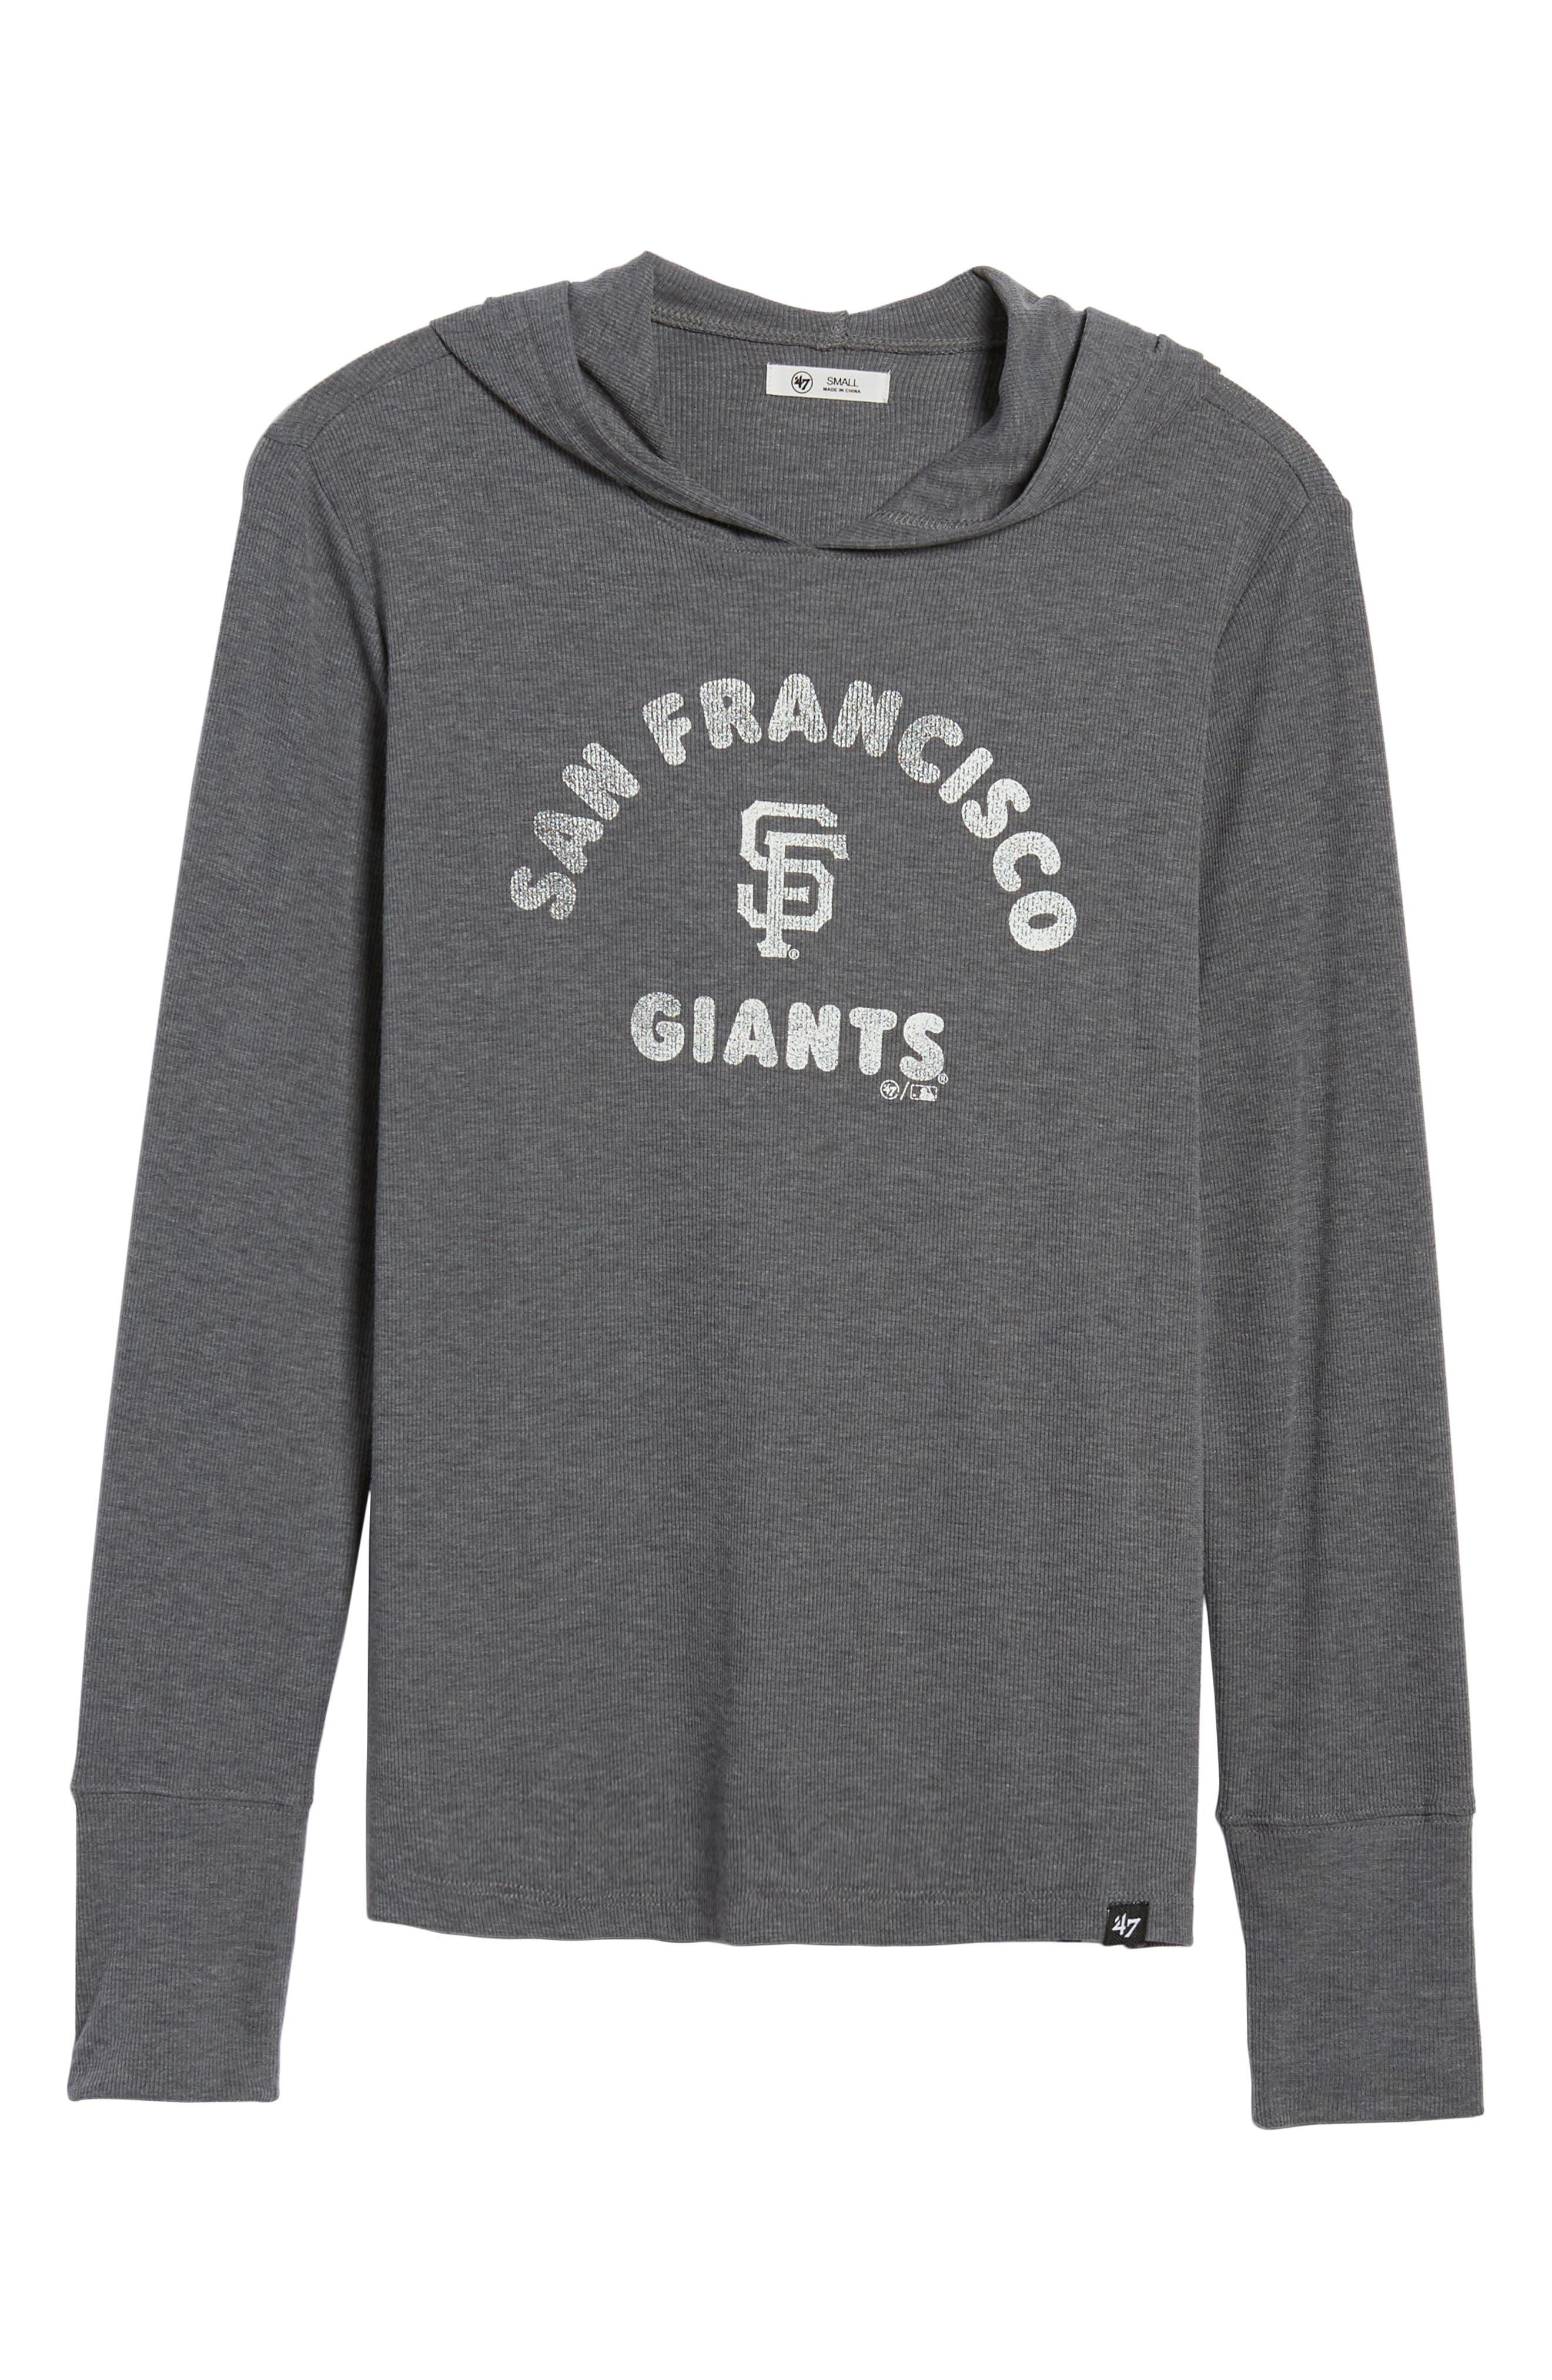 Campbell San Francisco Giants Rib Knit Hooded Top,                             Alternate thumbnail 7, color,                             Submarine